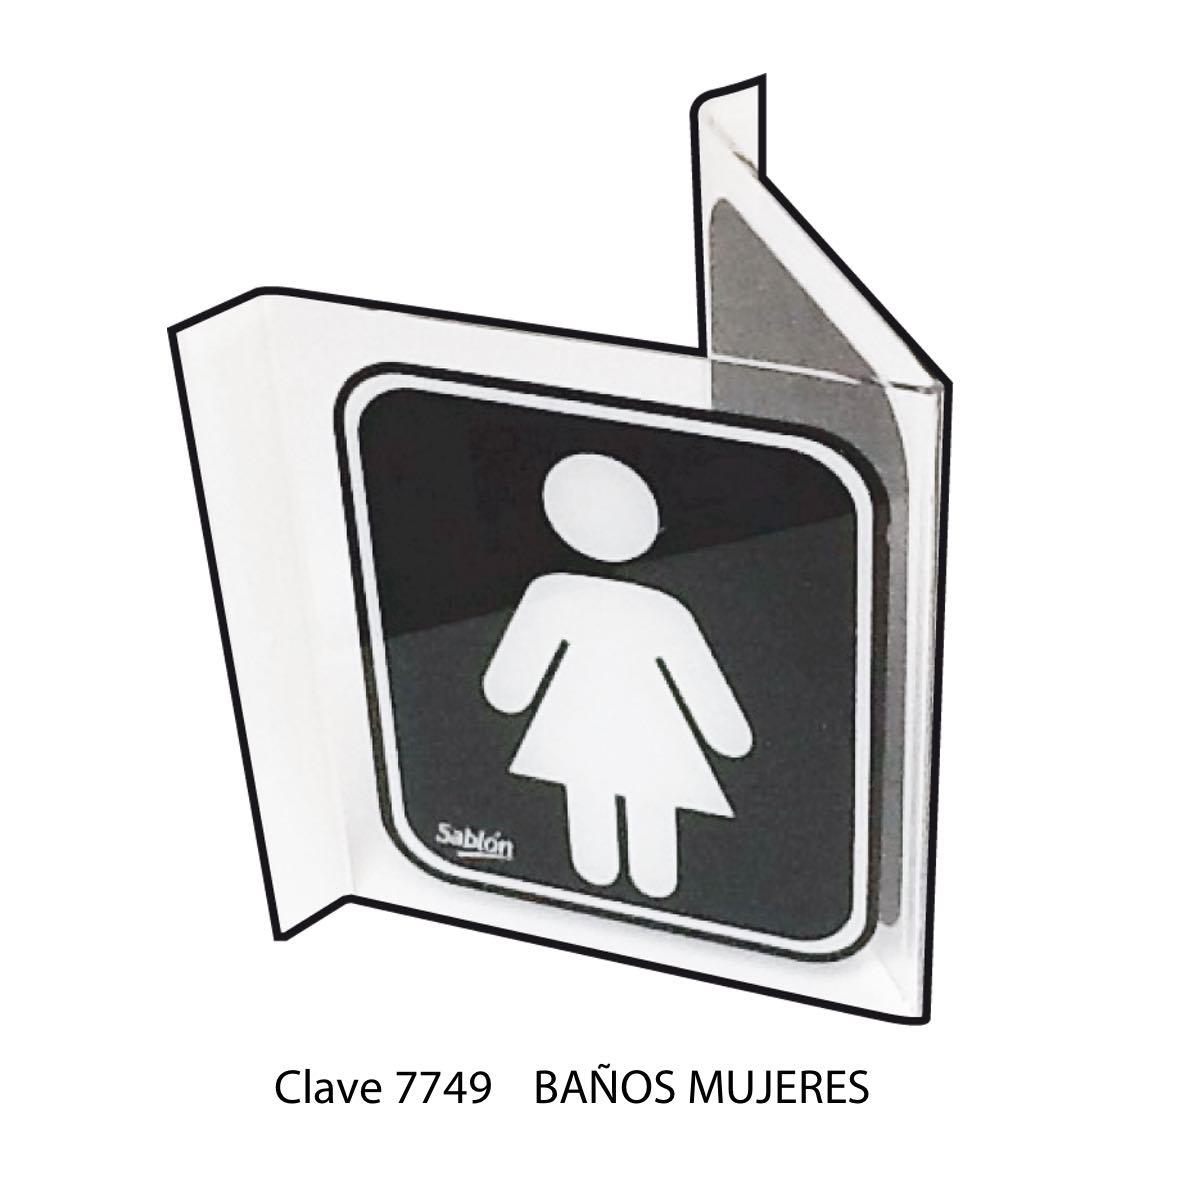 Señal Baños Mujeres Modelo 7749 - Sablón